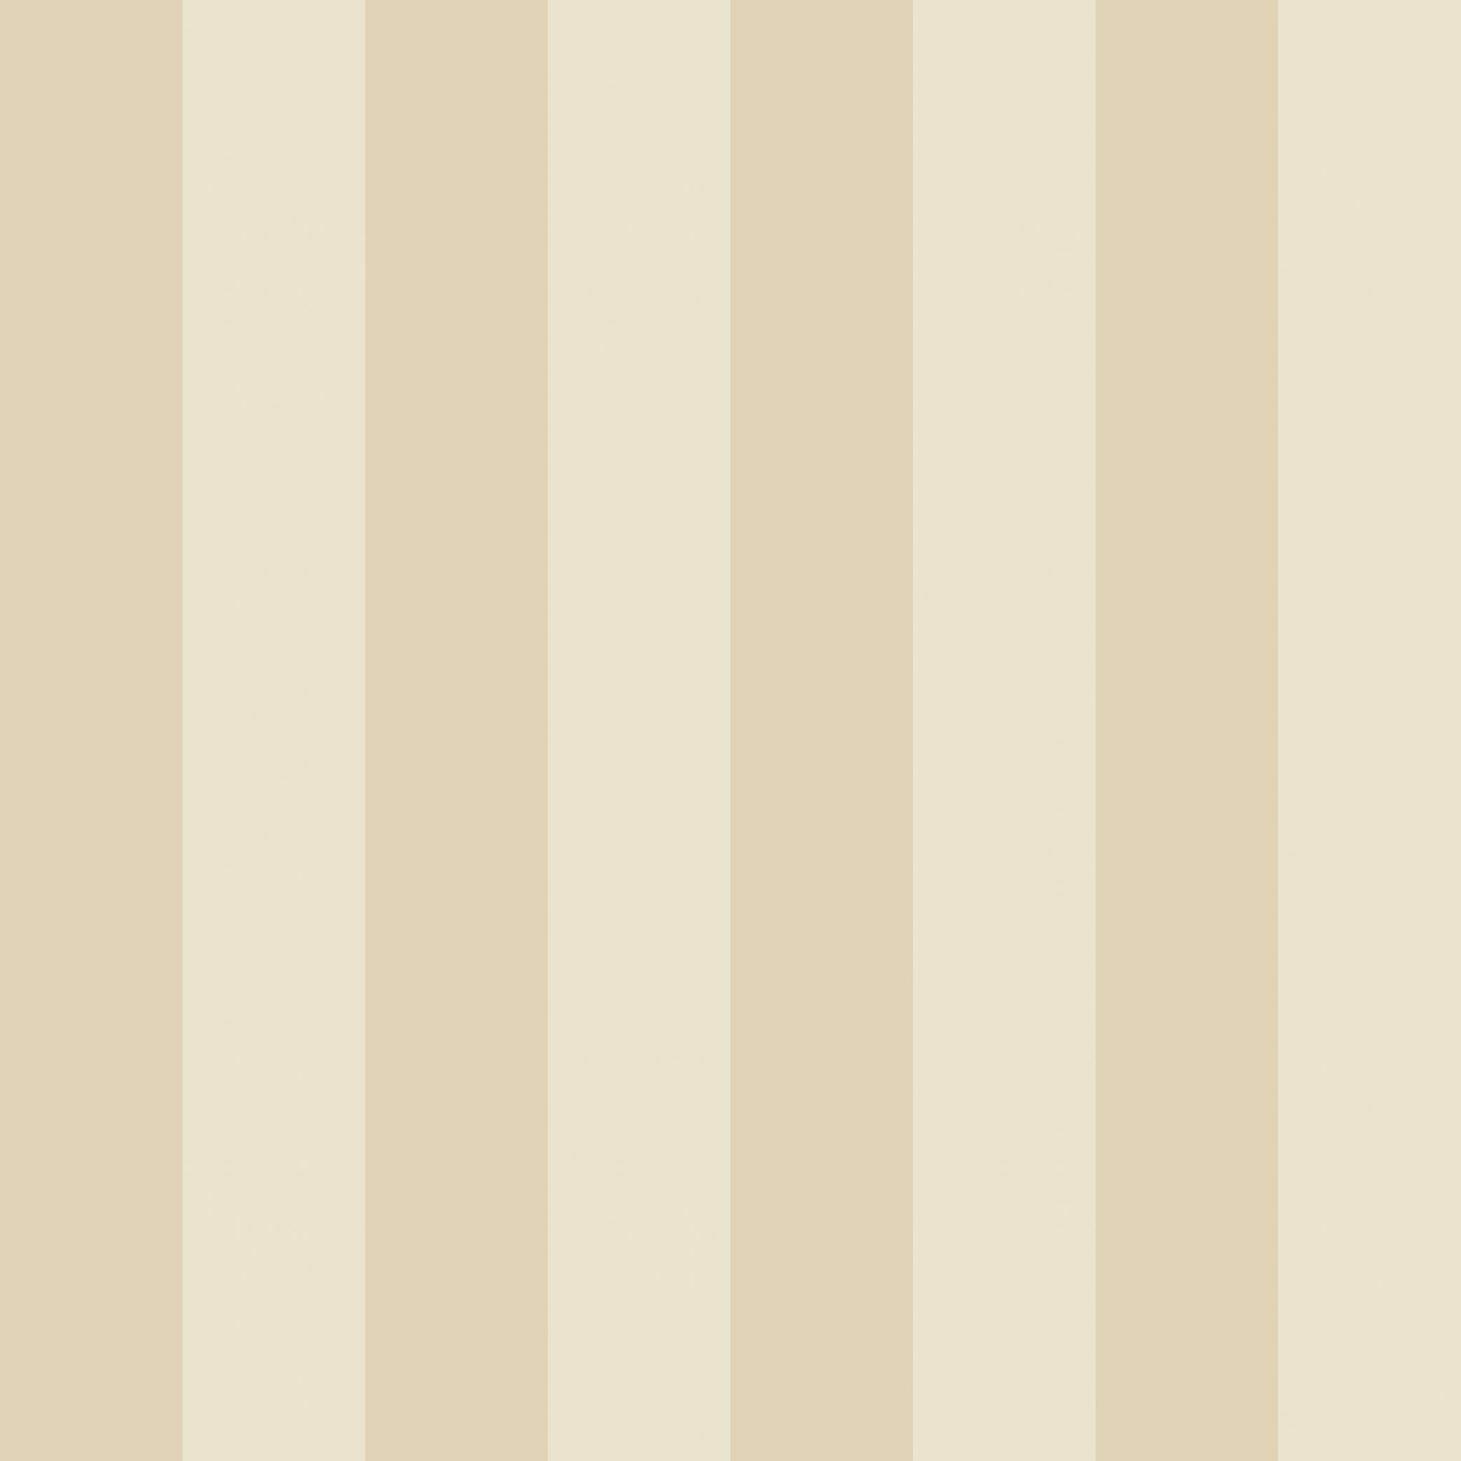 Essener Tapete Simply Stripes 3 Sy33920 Beige Stripes Striped Vinyl Wallpaper